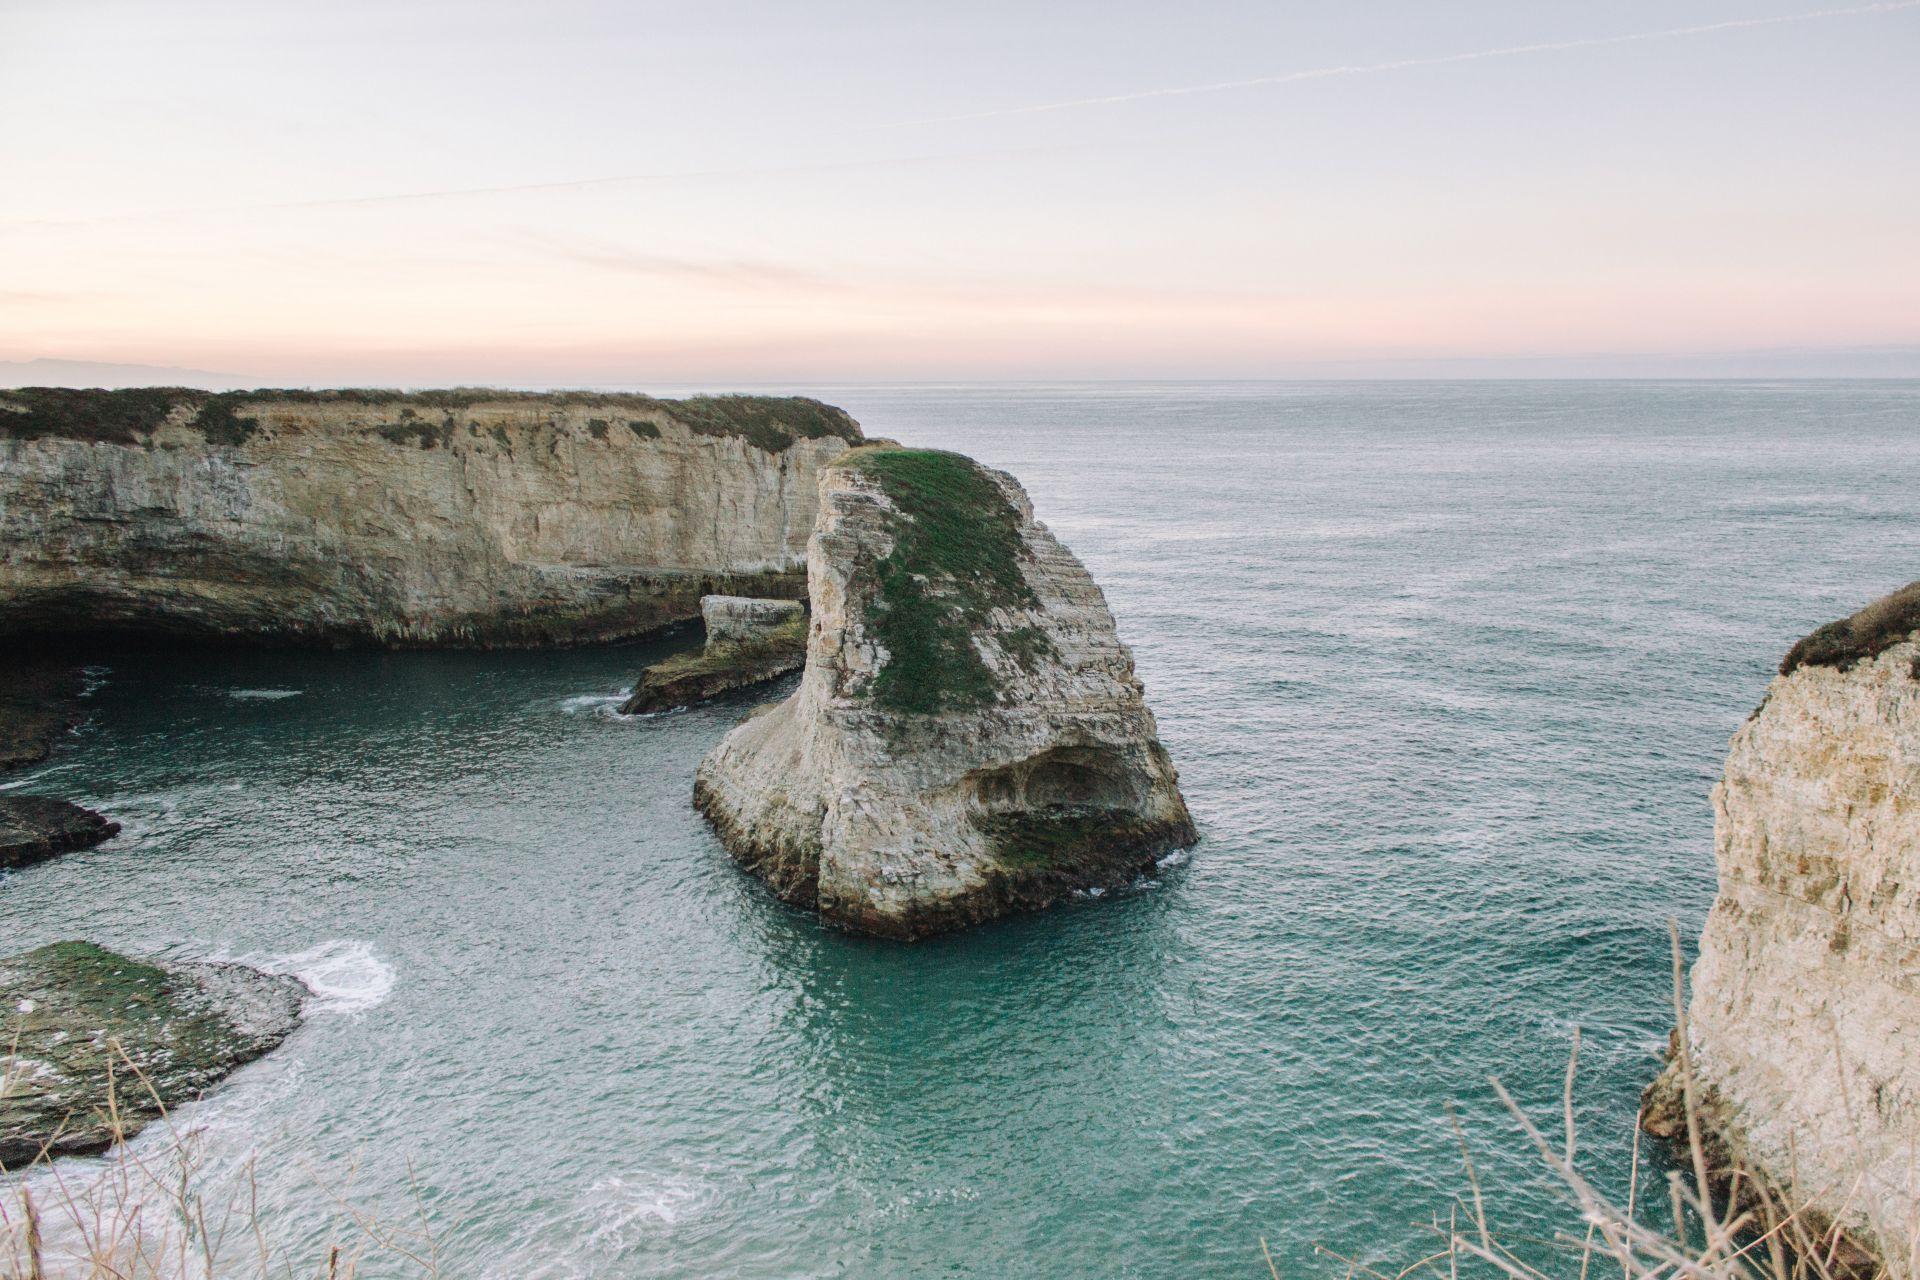 how to make 2018 your best year yet | shark fin cove, davenport, california sarahmichiko.com